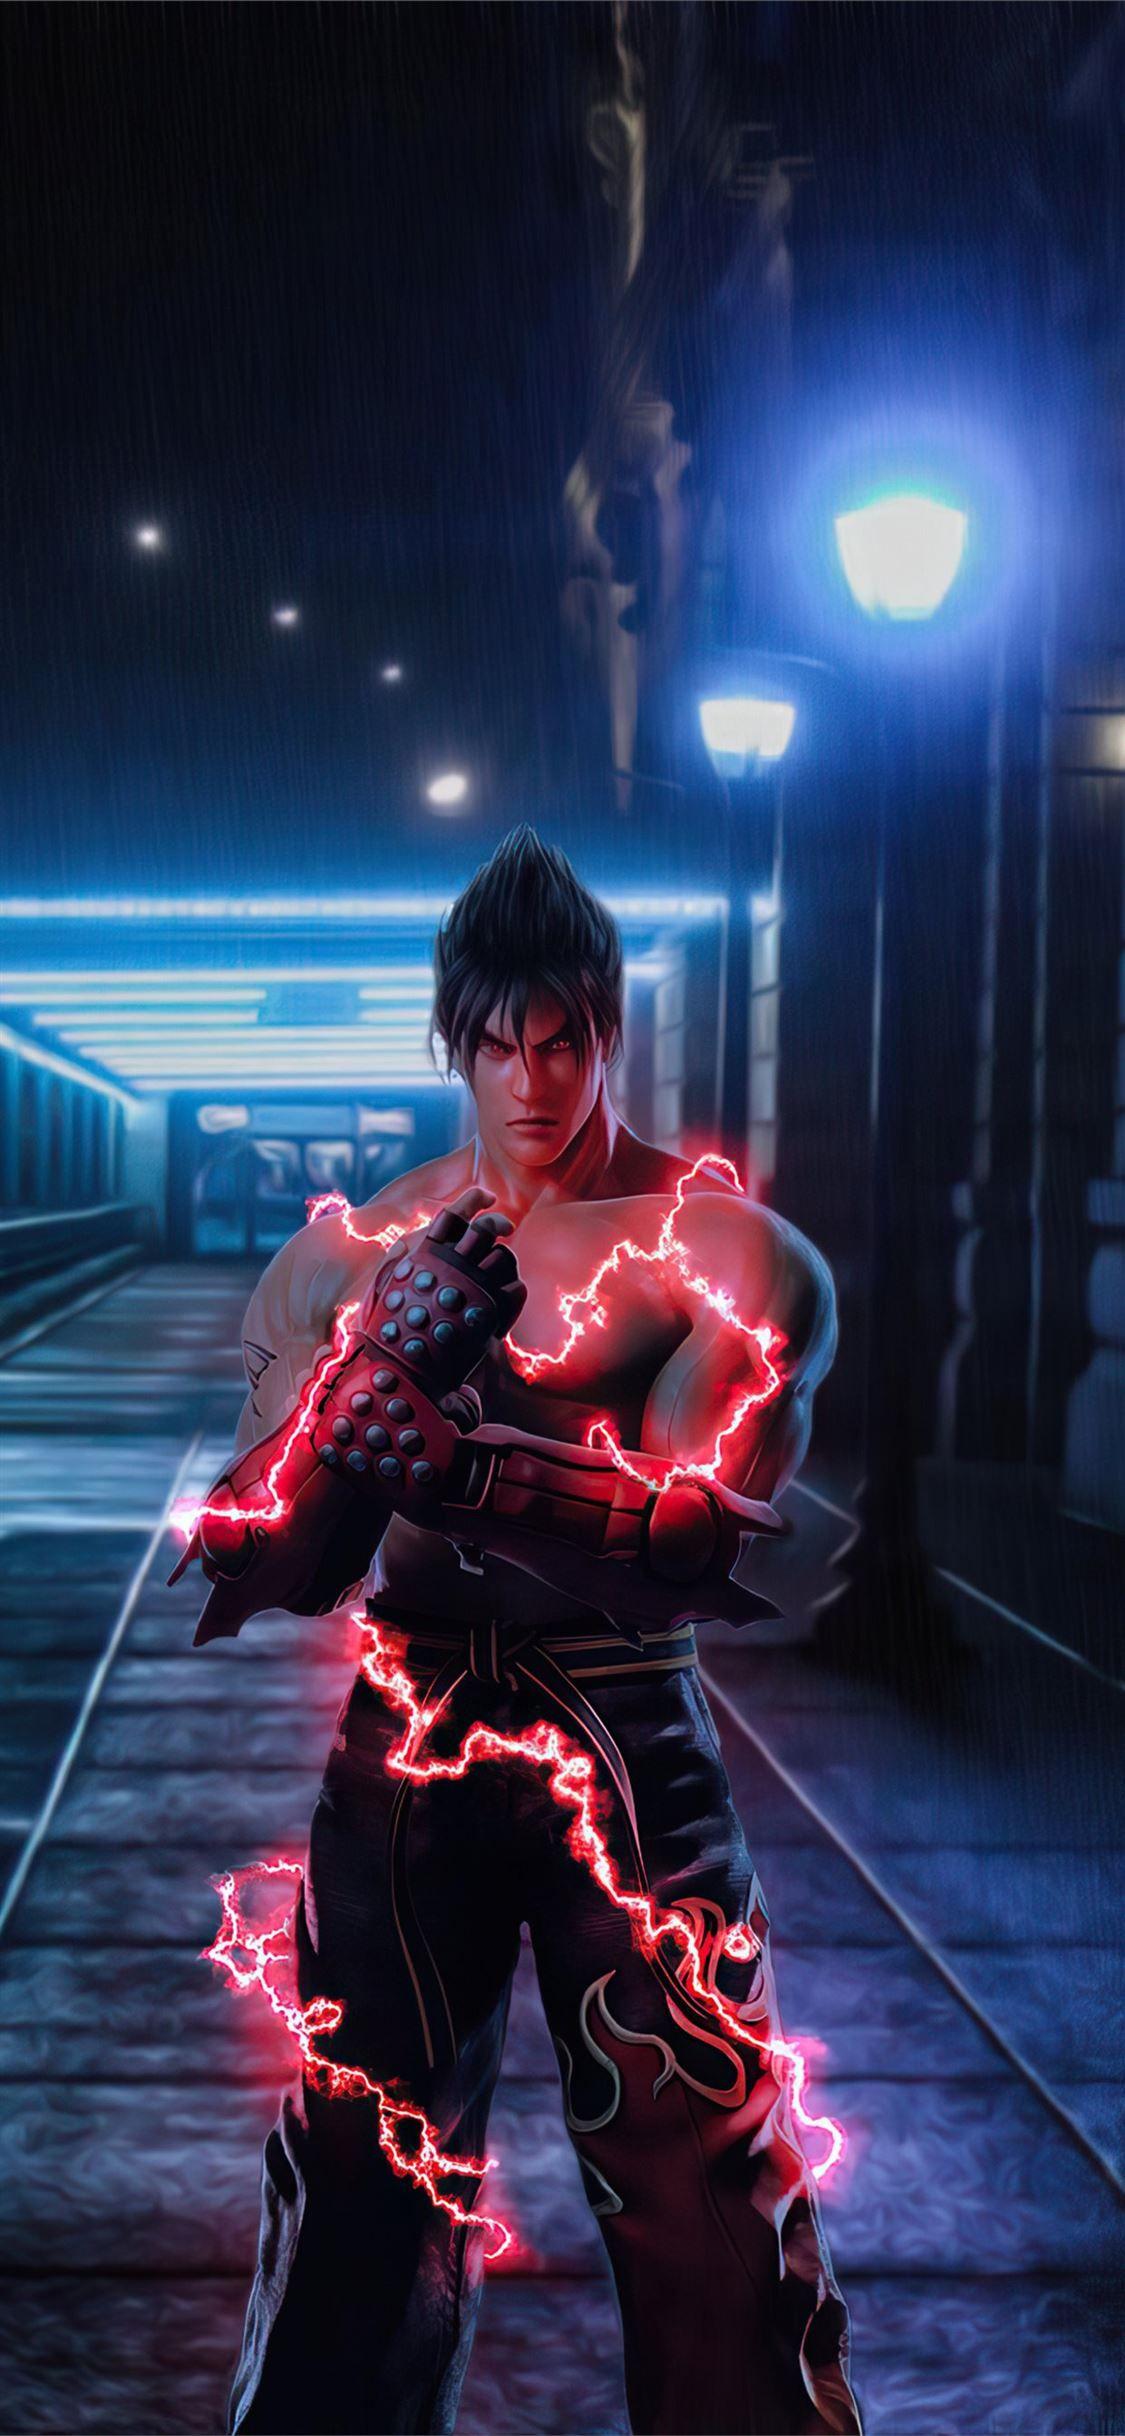 Tekken 7 Jin Kazama Tekken7 Games Psgames 4k 2020games Iphonexwallpaper Jin Kazama Tekken 7 Jin Tekken 7